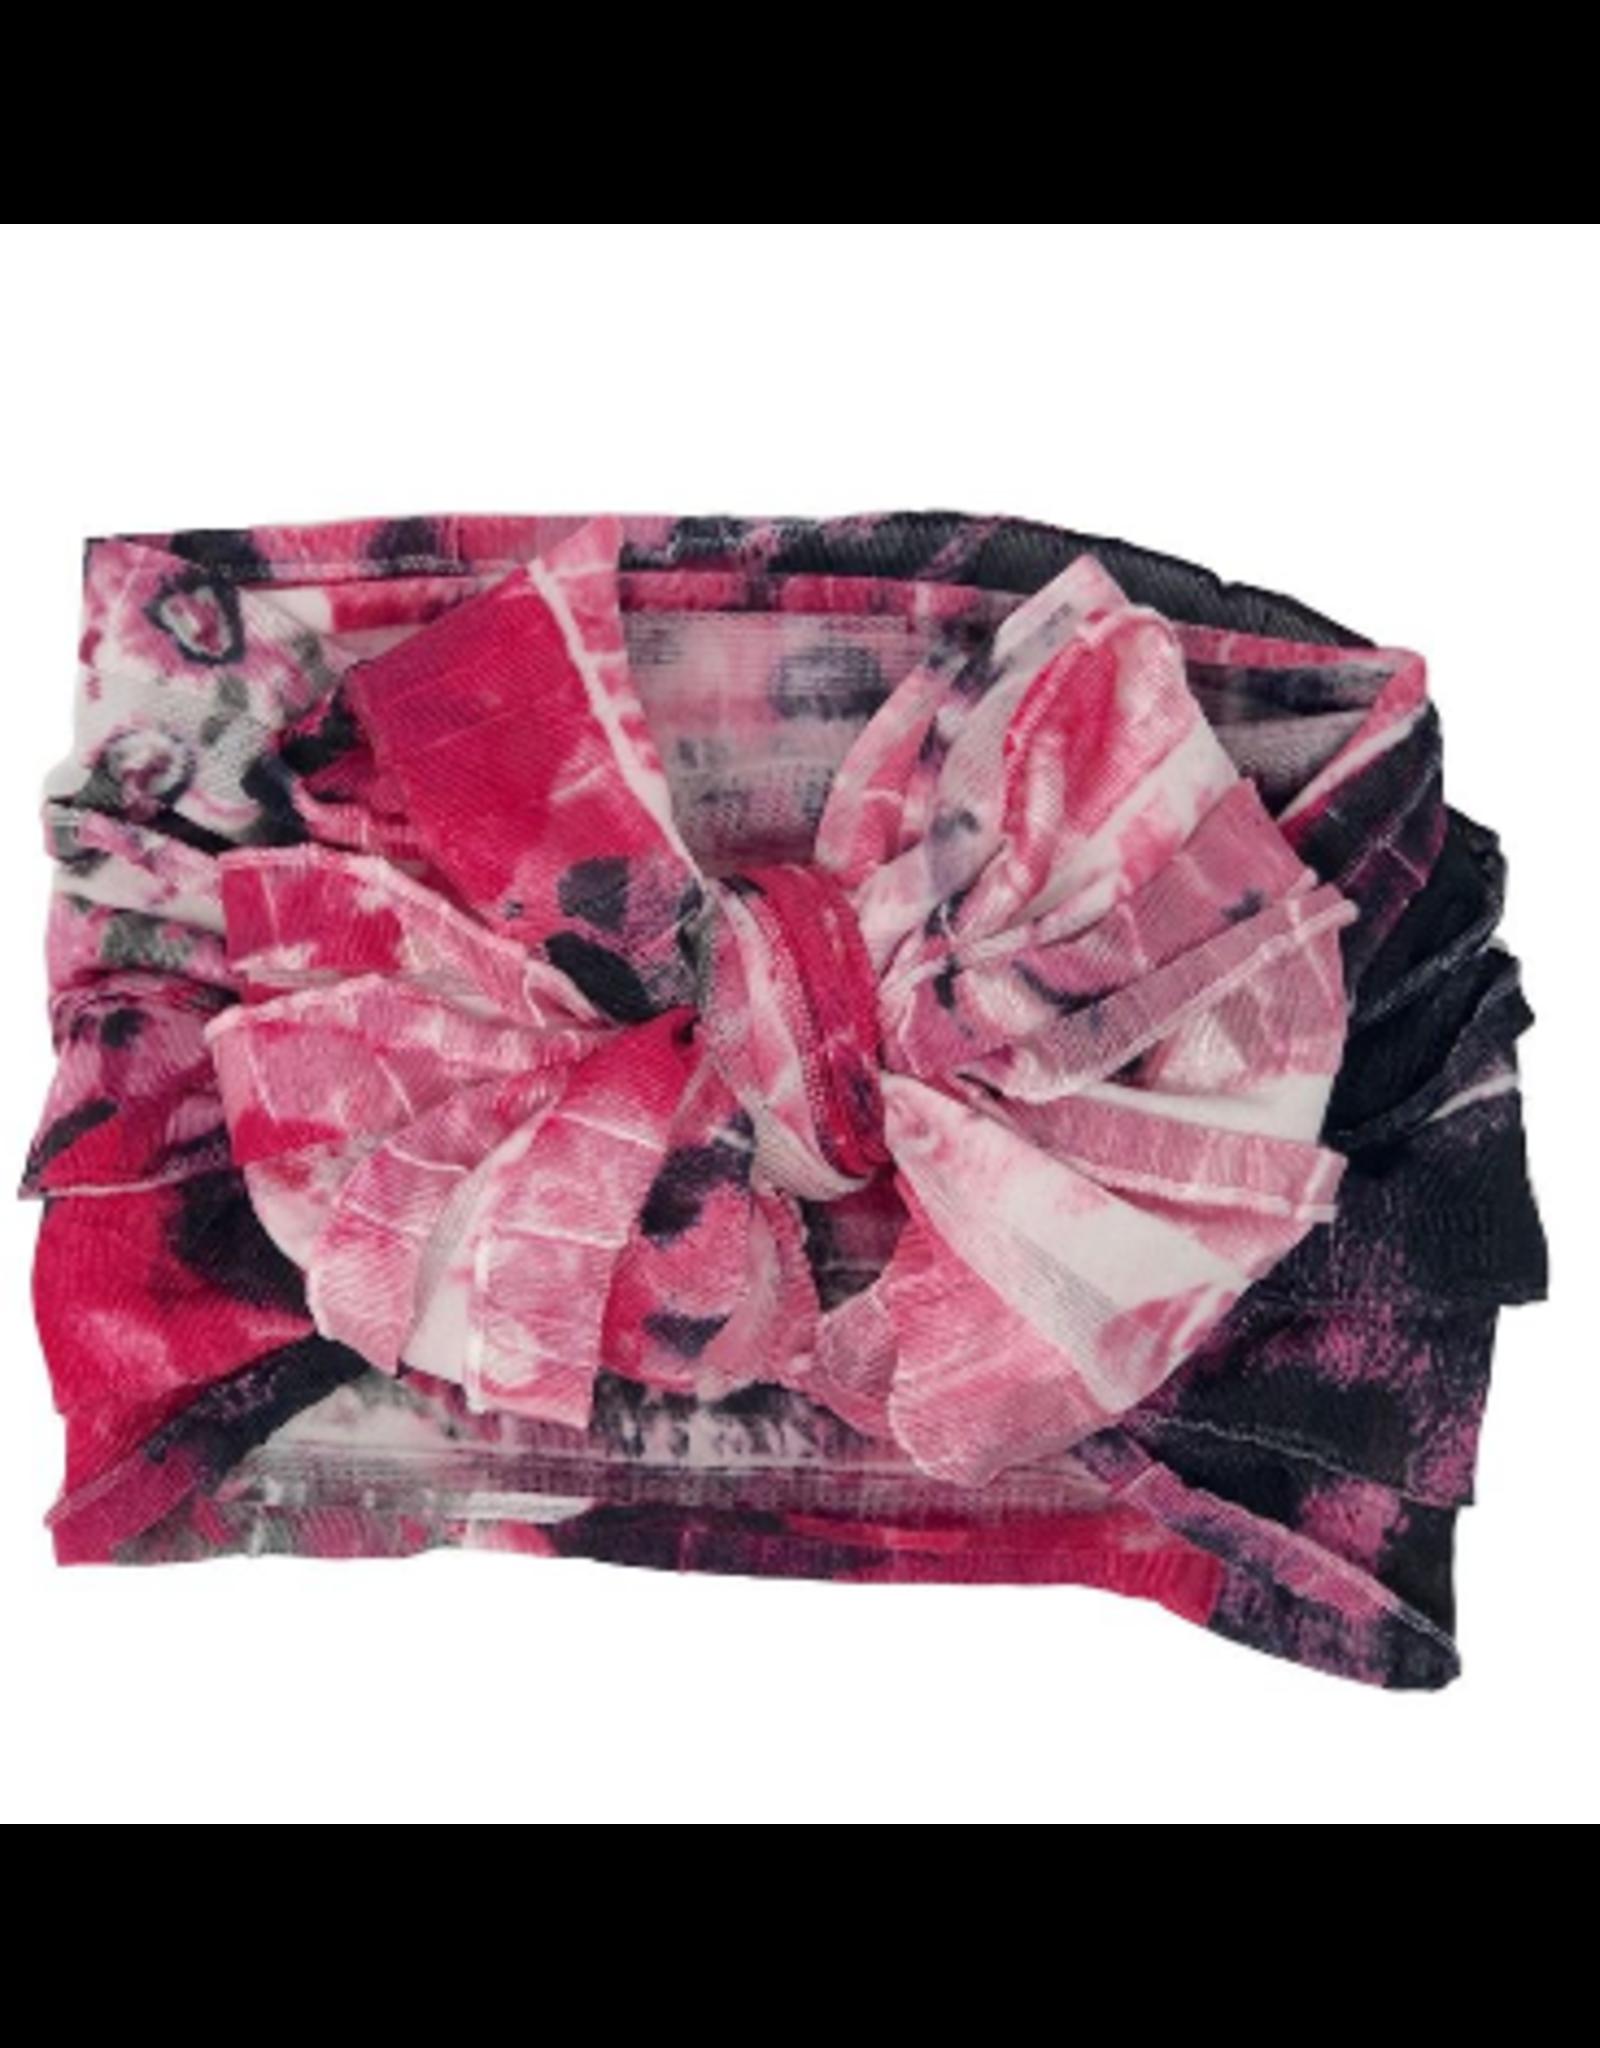 In Awe- Bright Pink Blossom Headband